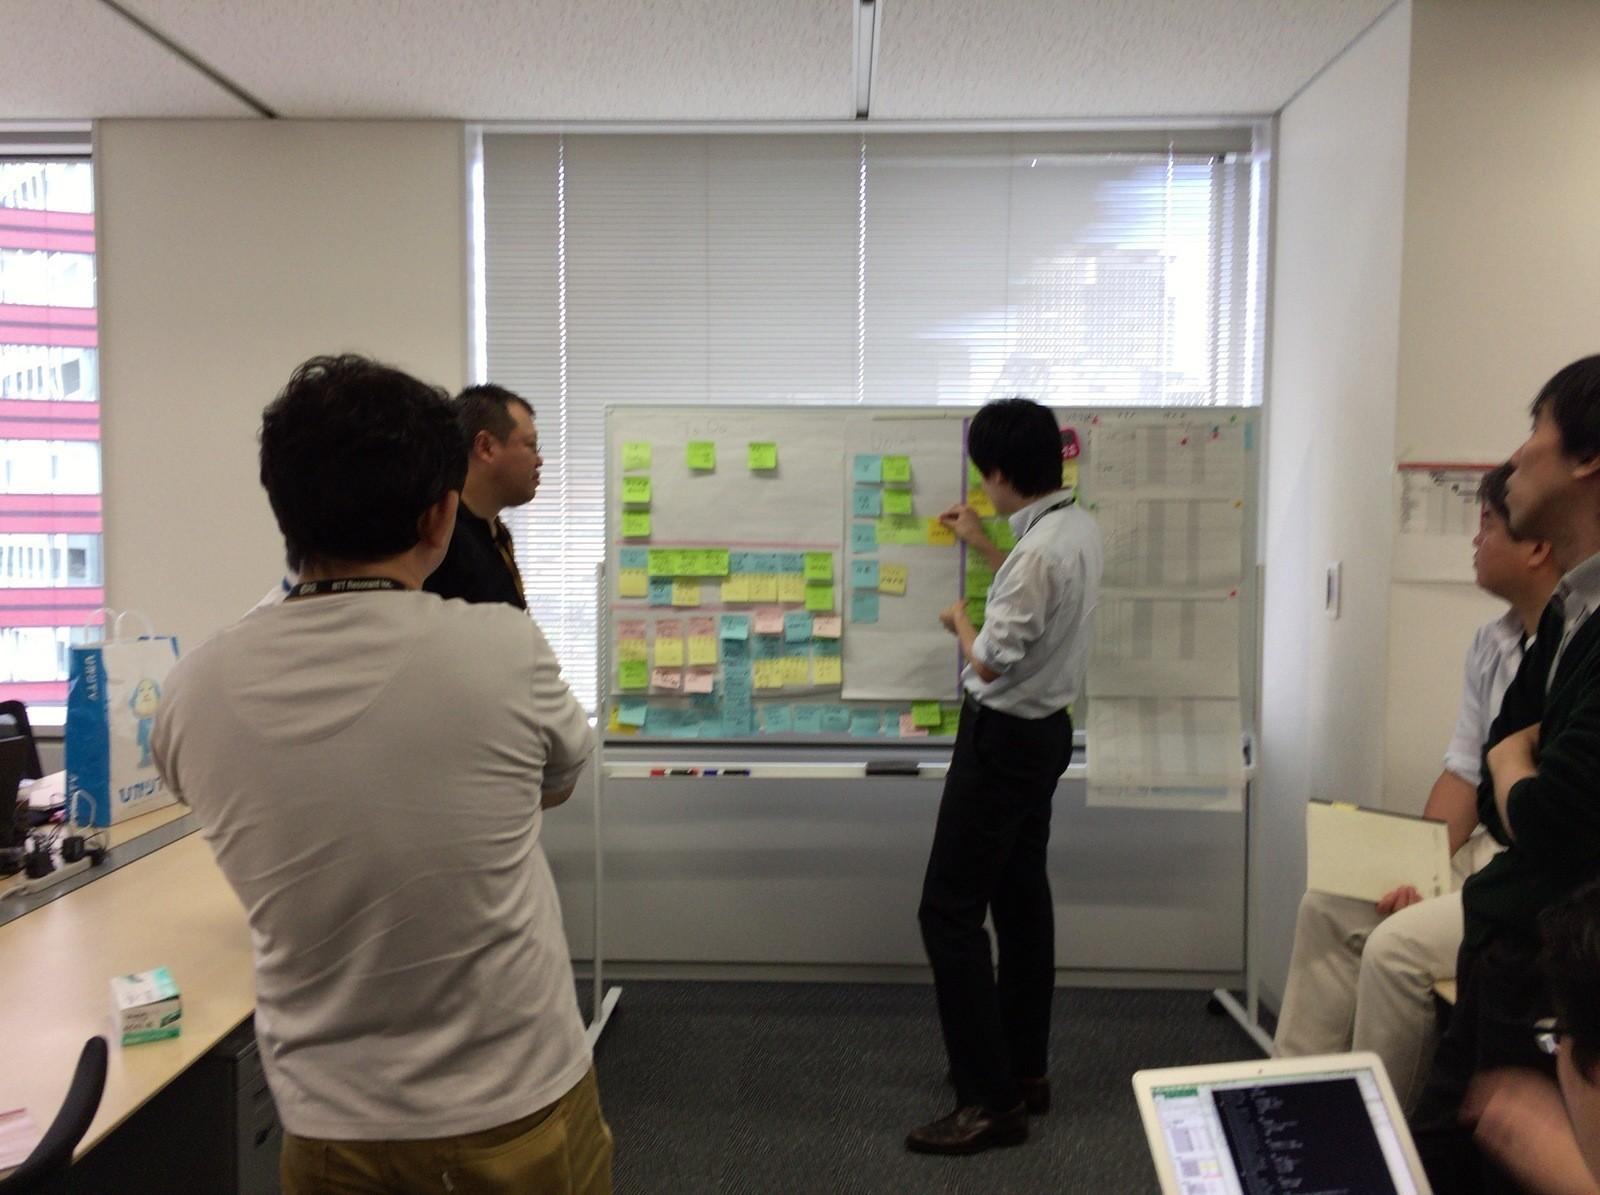 【Android開発】シェアトップクラス・NTTの有料クラウドストレージサービス「マイポケット」をアジャイル開発するエンジニア募集!